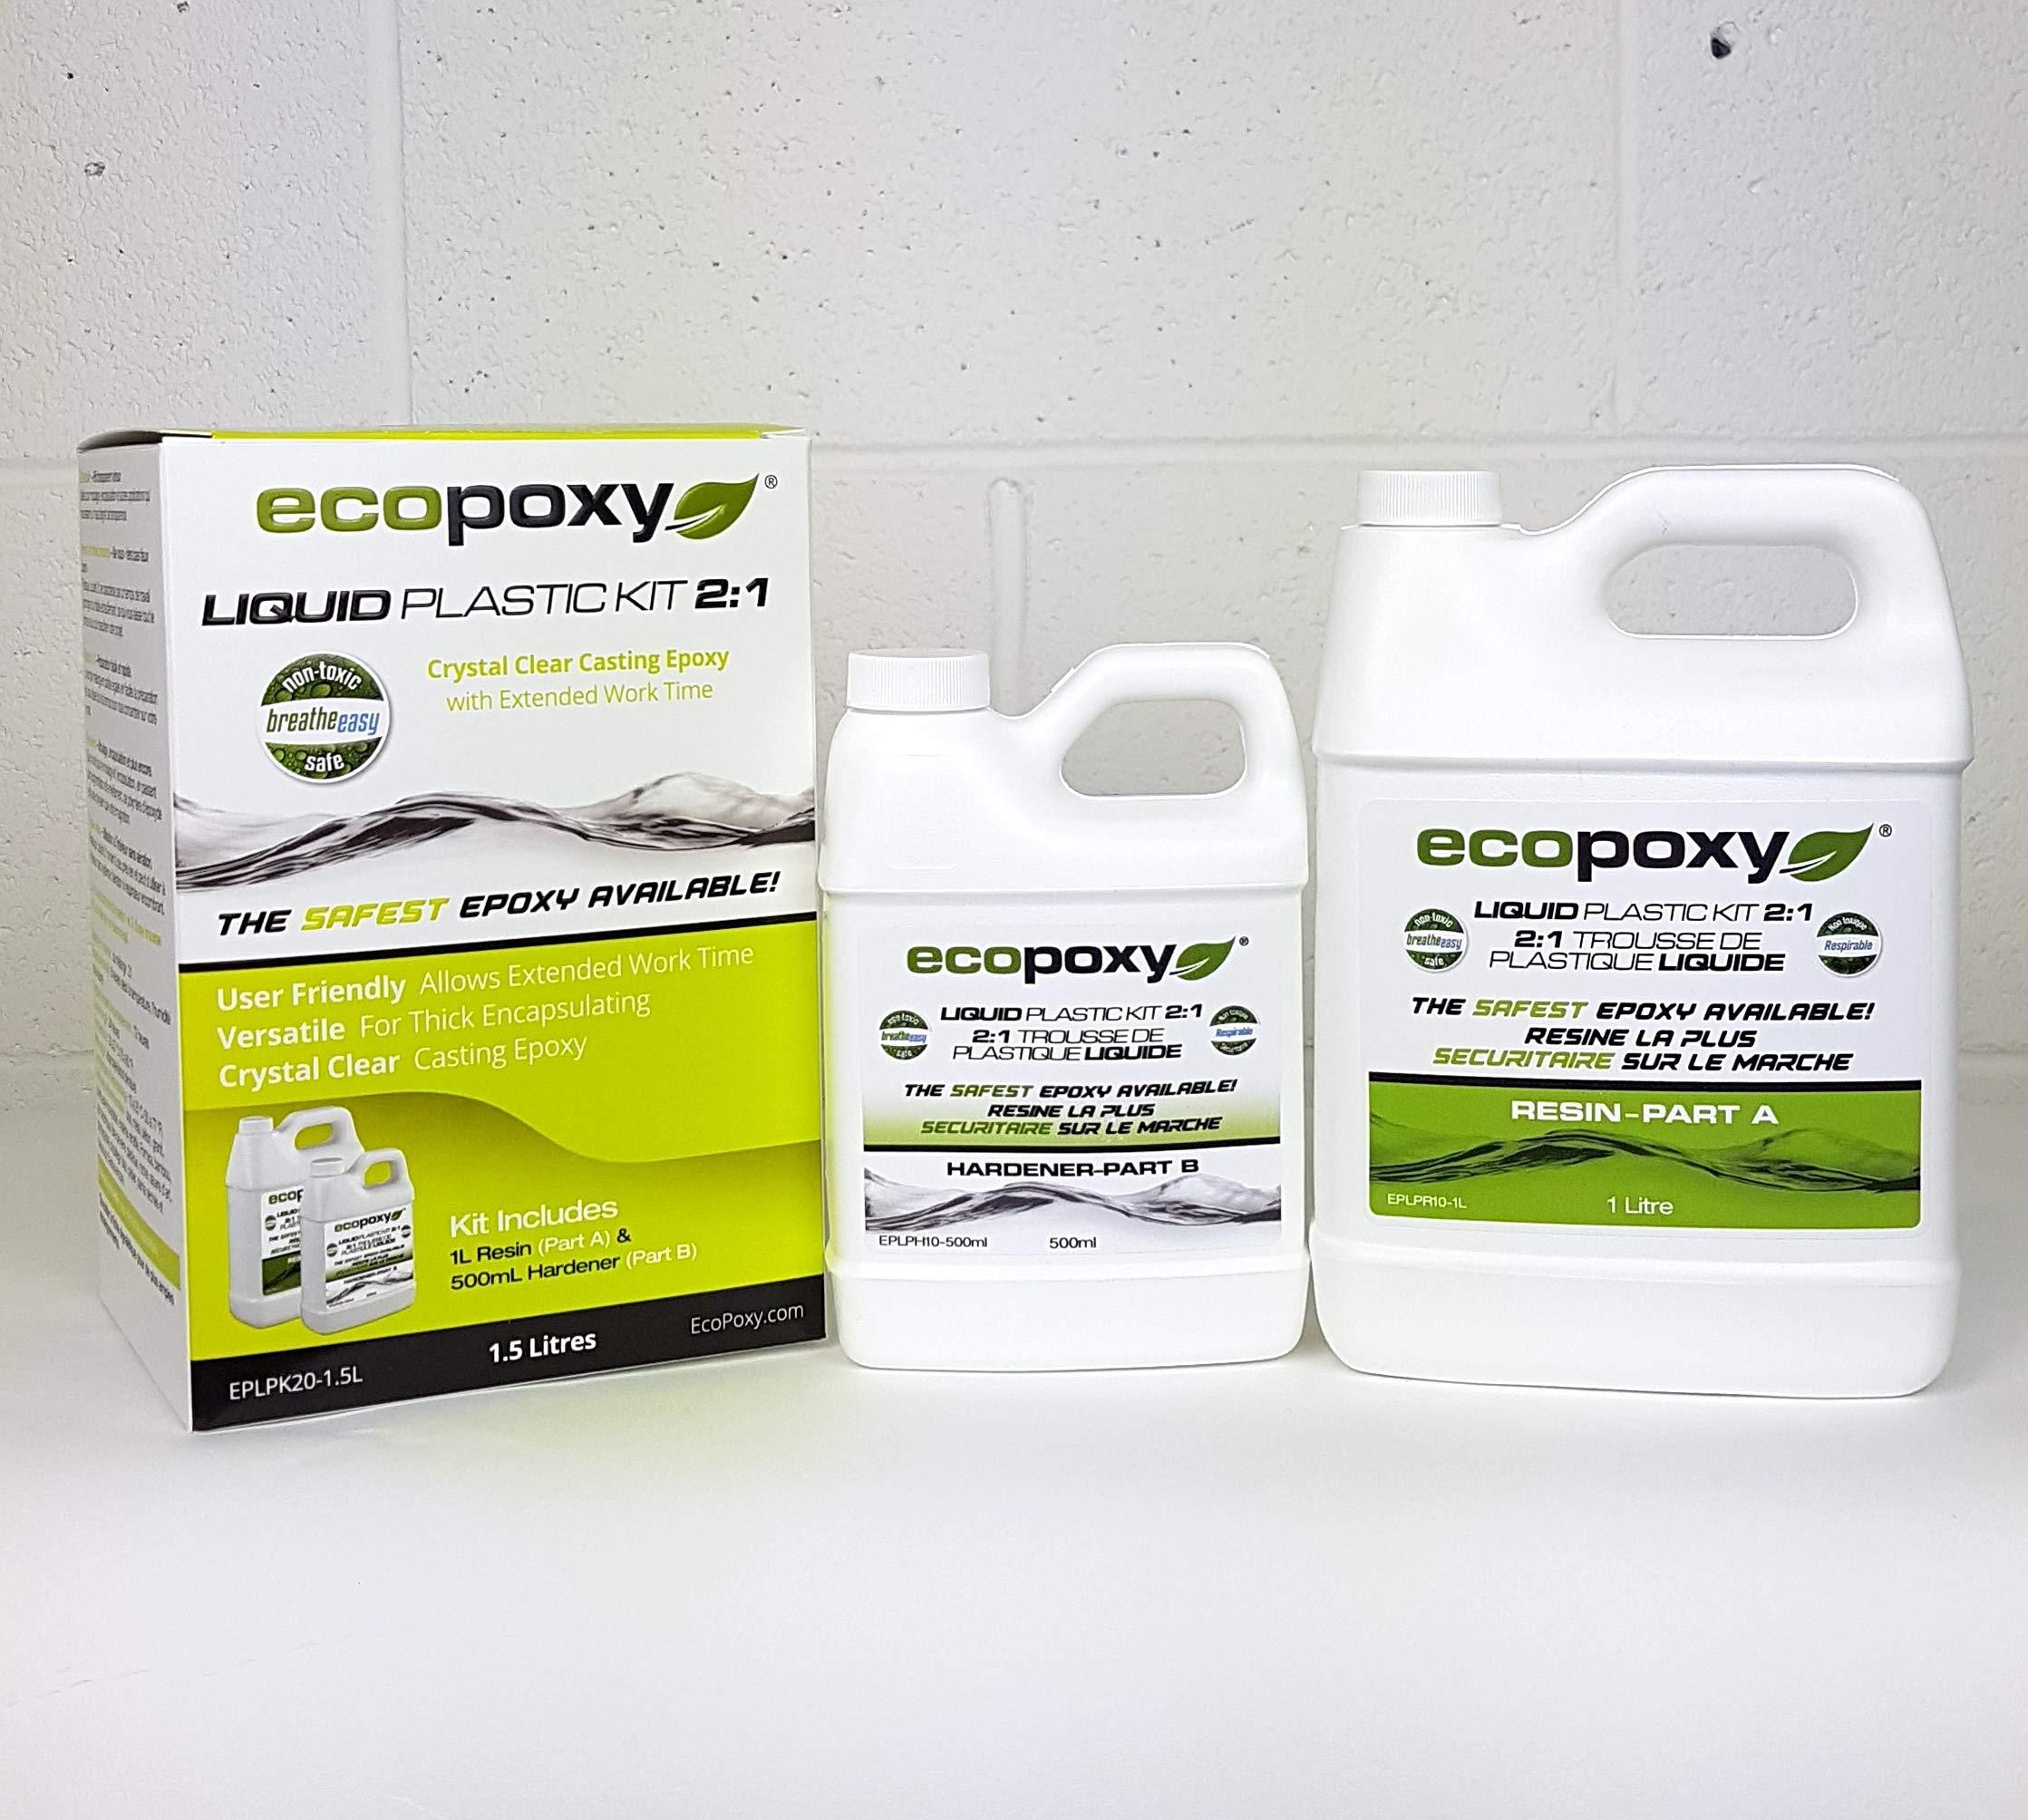 Ecopoxy Liquid Plastic 1.5L - 2:1 Ratio Sold by OM Creation Inc